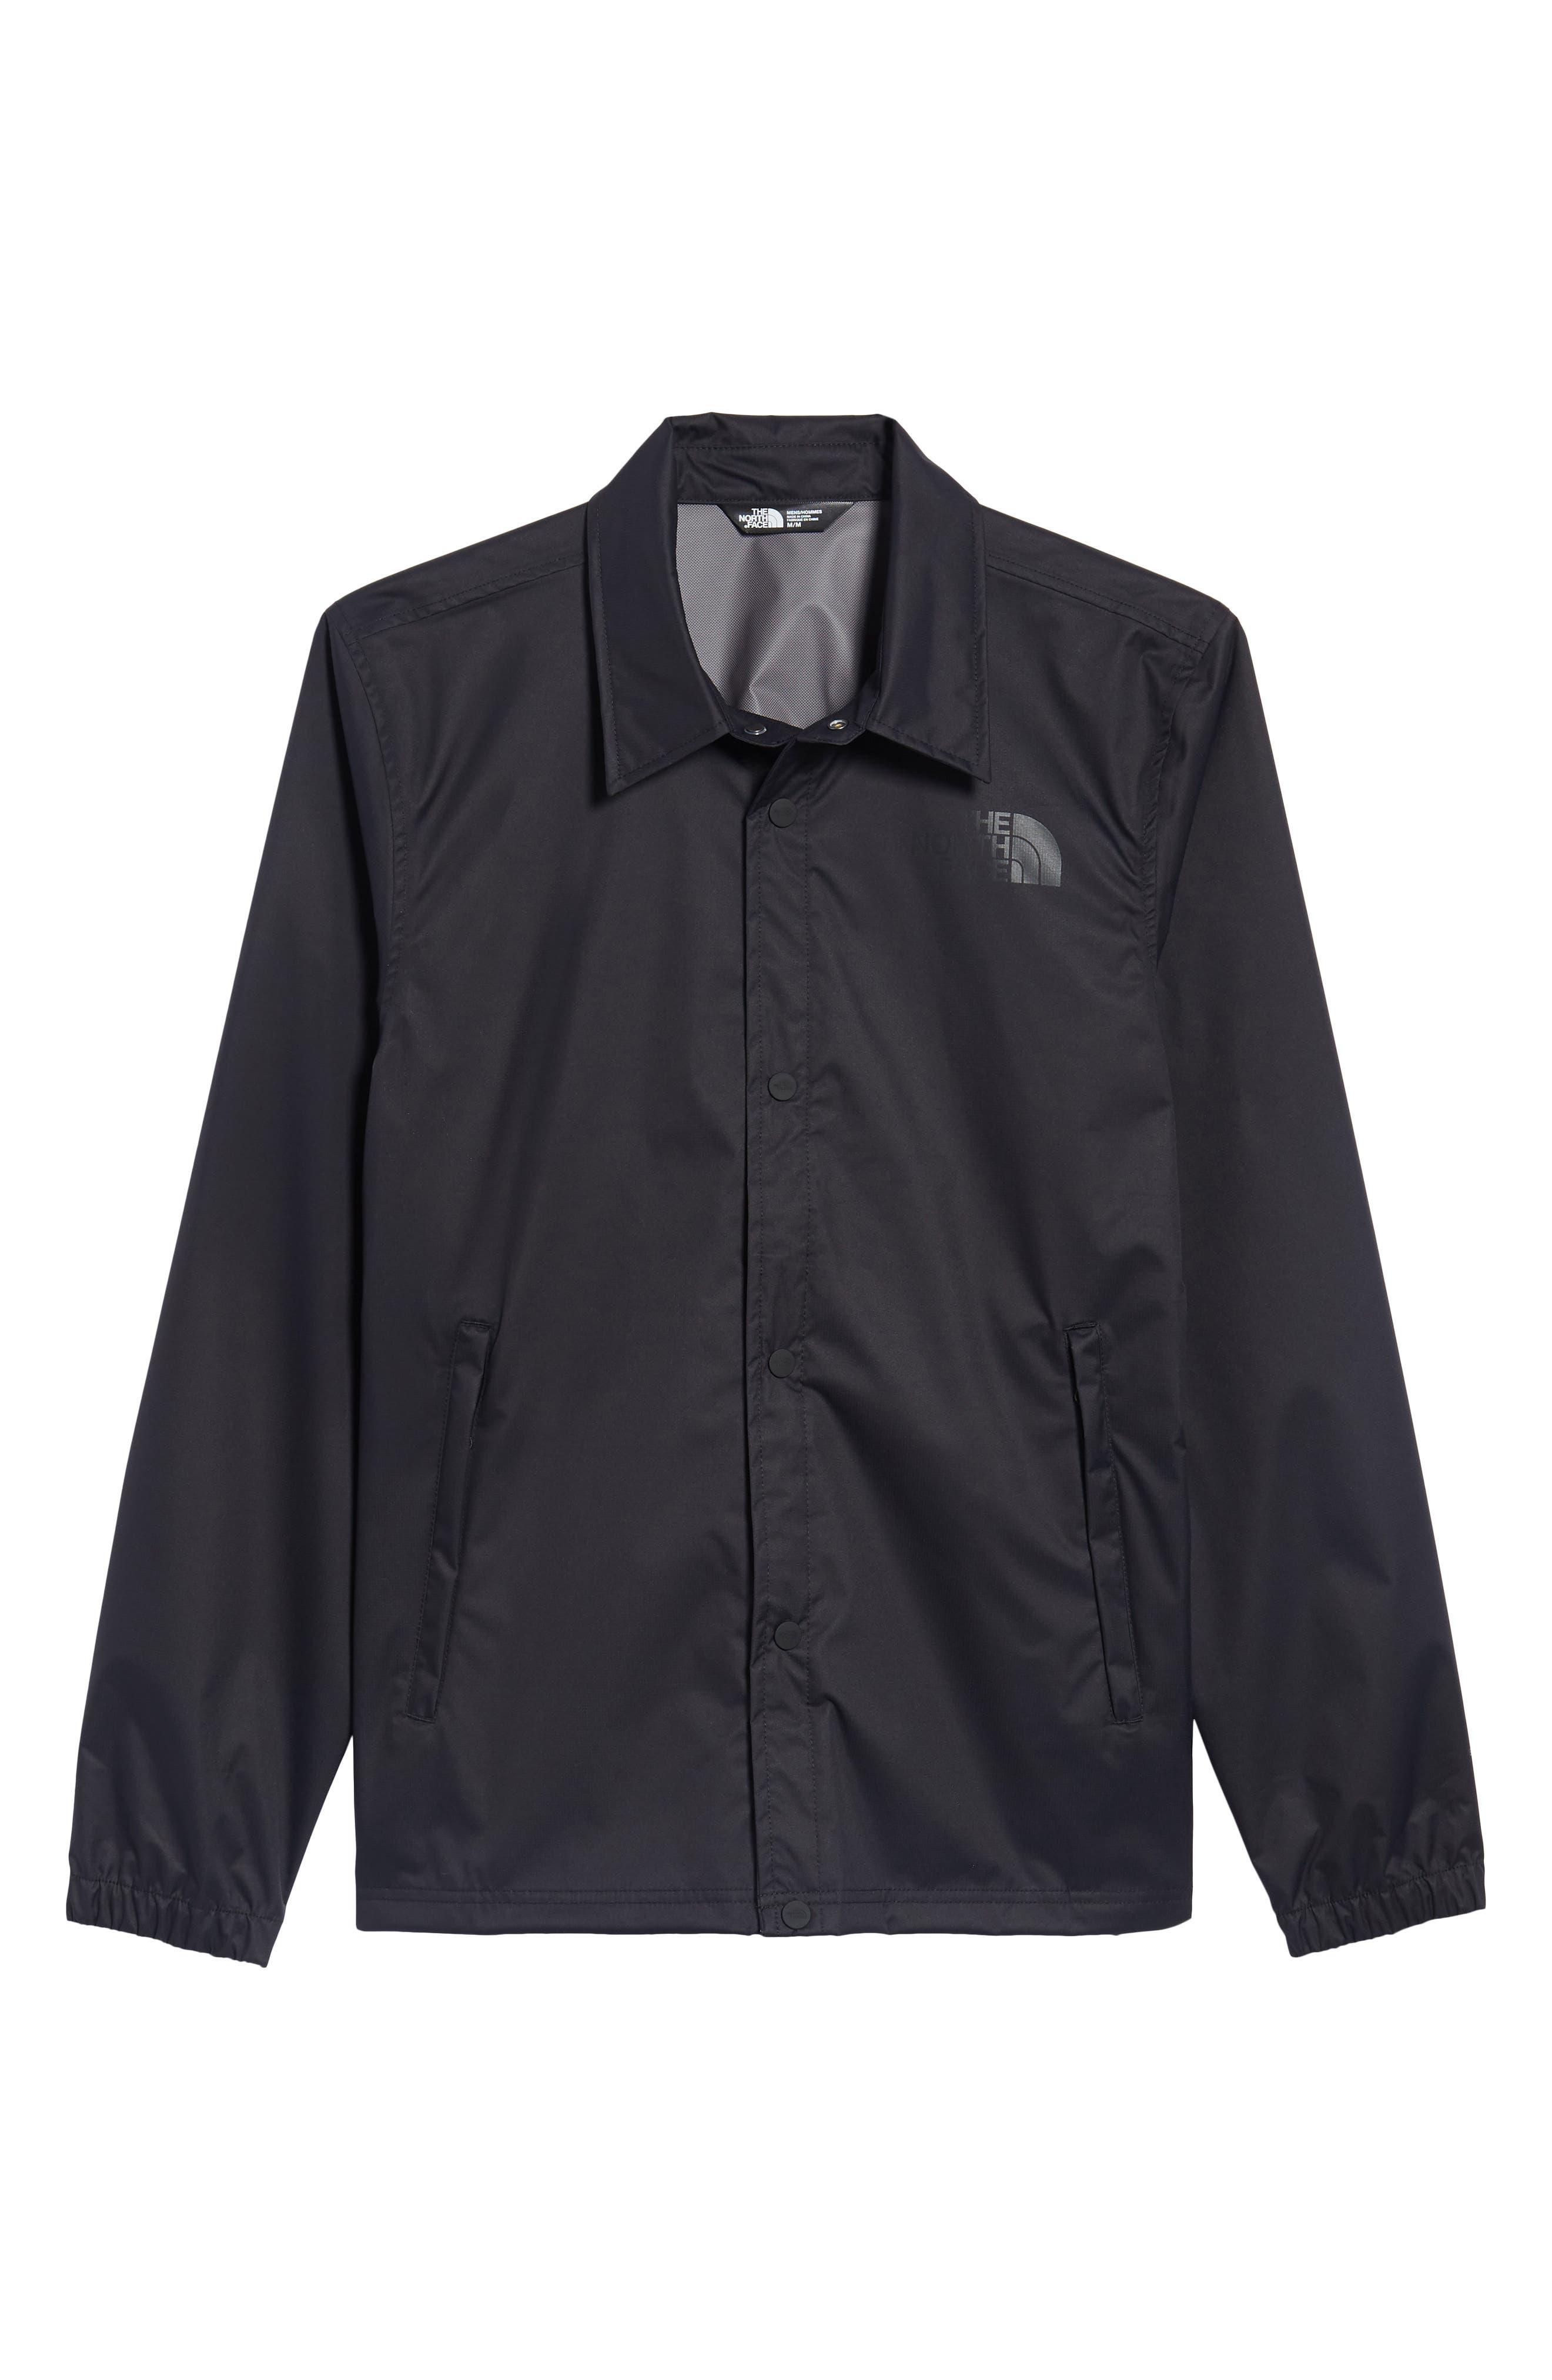 Coaches Rain Jacket,                             Alternate thumbnail 5, color,                             001